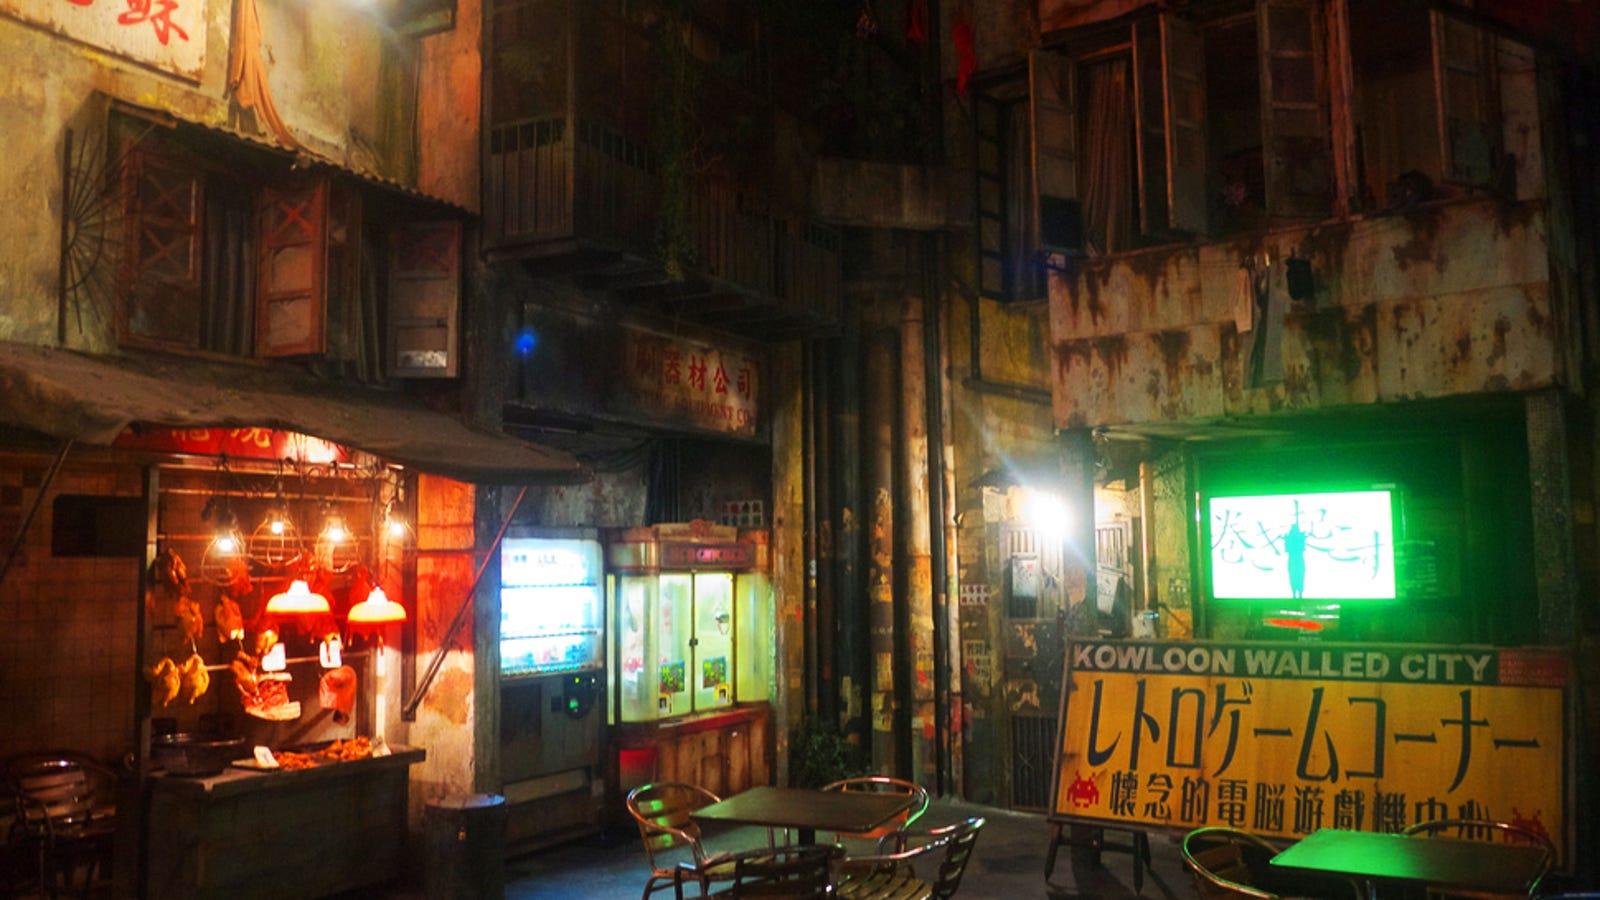 Hong Kong's Infamous Kowloon Walled City Rebuilt as Amusement Park